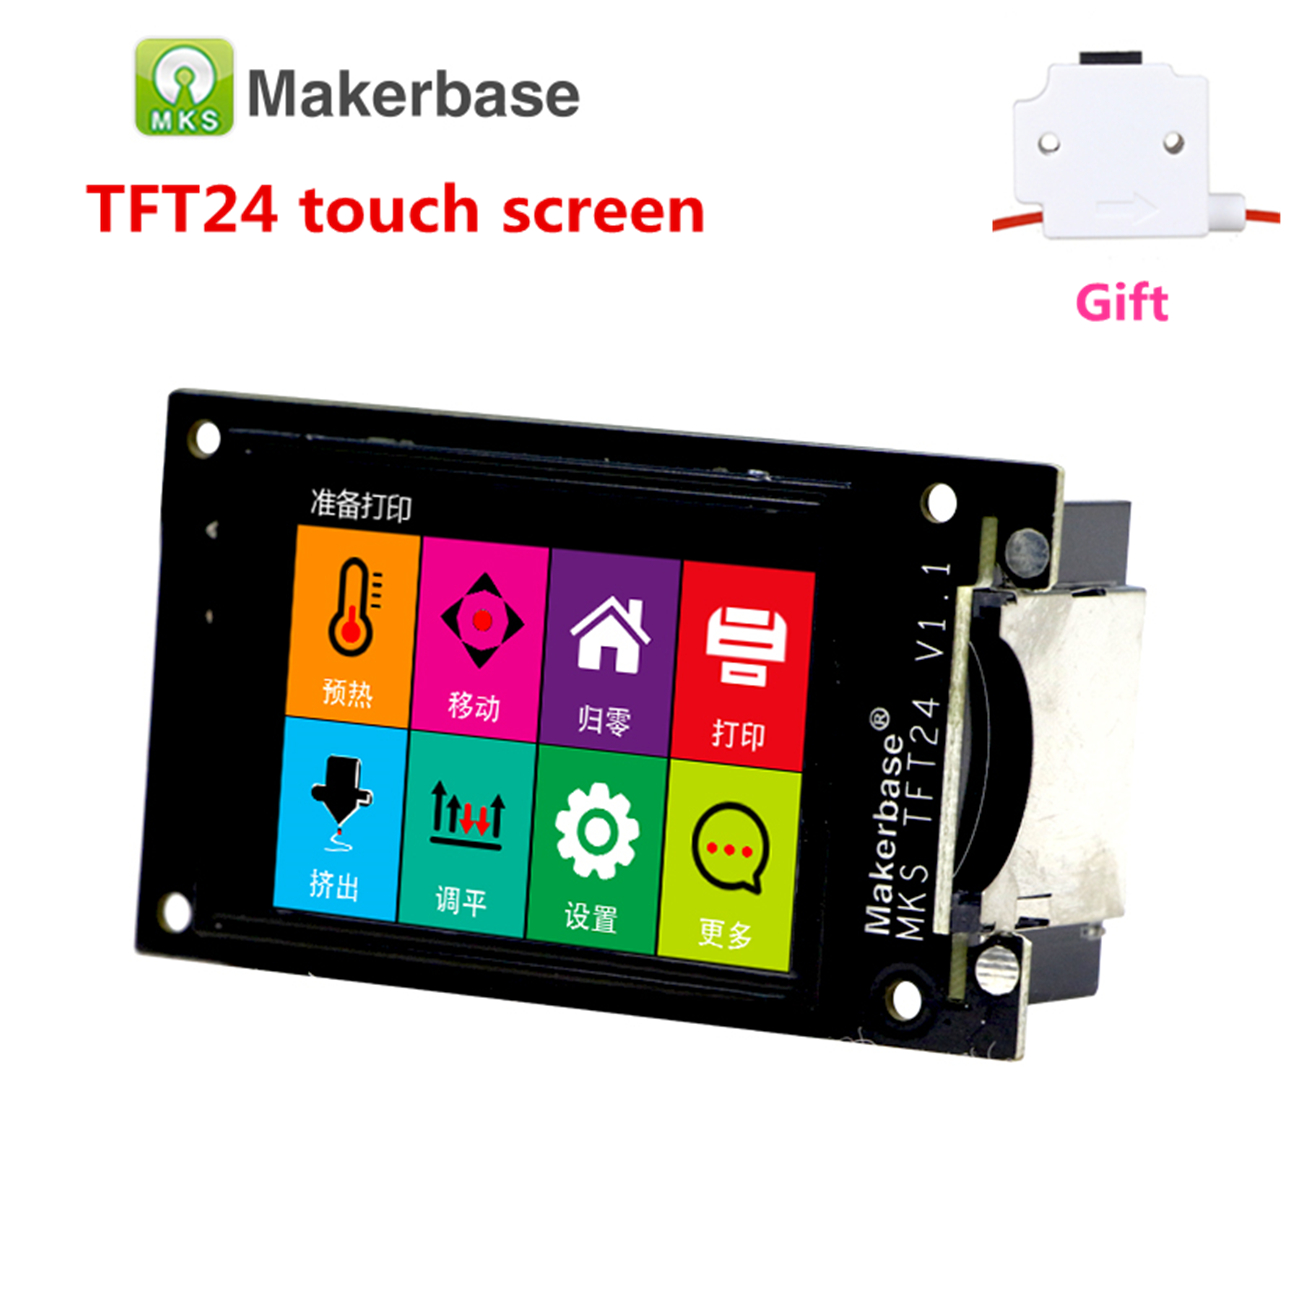 3d Printing Elements MKS TFT24 Touch Screen V1.1 RepRap Controller Panel Full Color Display SainSmart Splash Screen Lcds Monitor